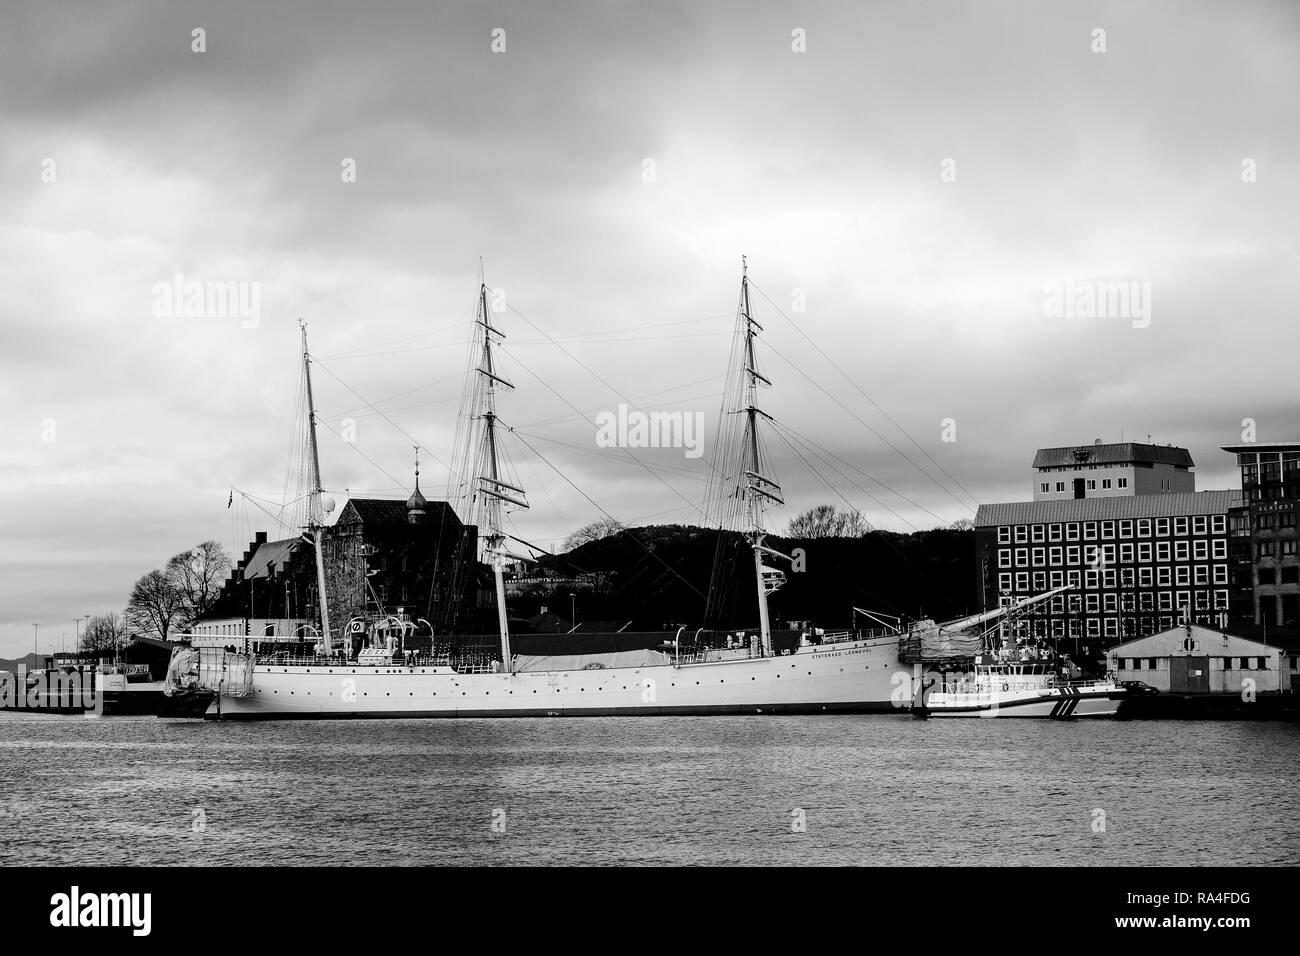 Norwegian training sail ship Statsraad Lehmkuhl berthed in Bergen, Norway. February 2007. - Stock Image